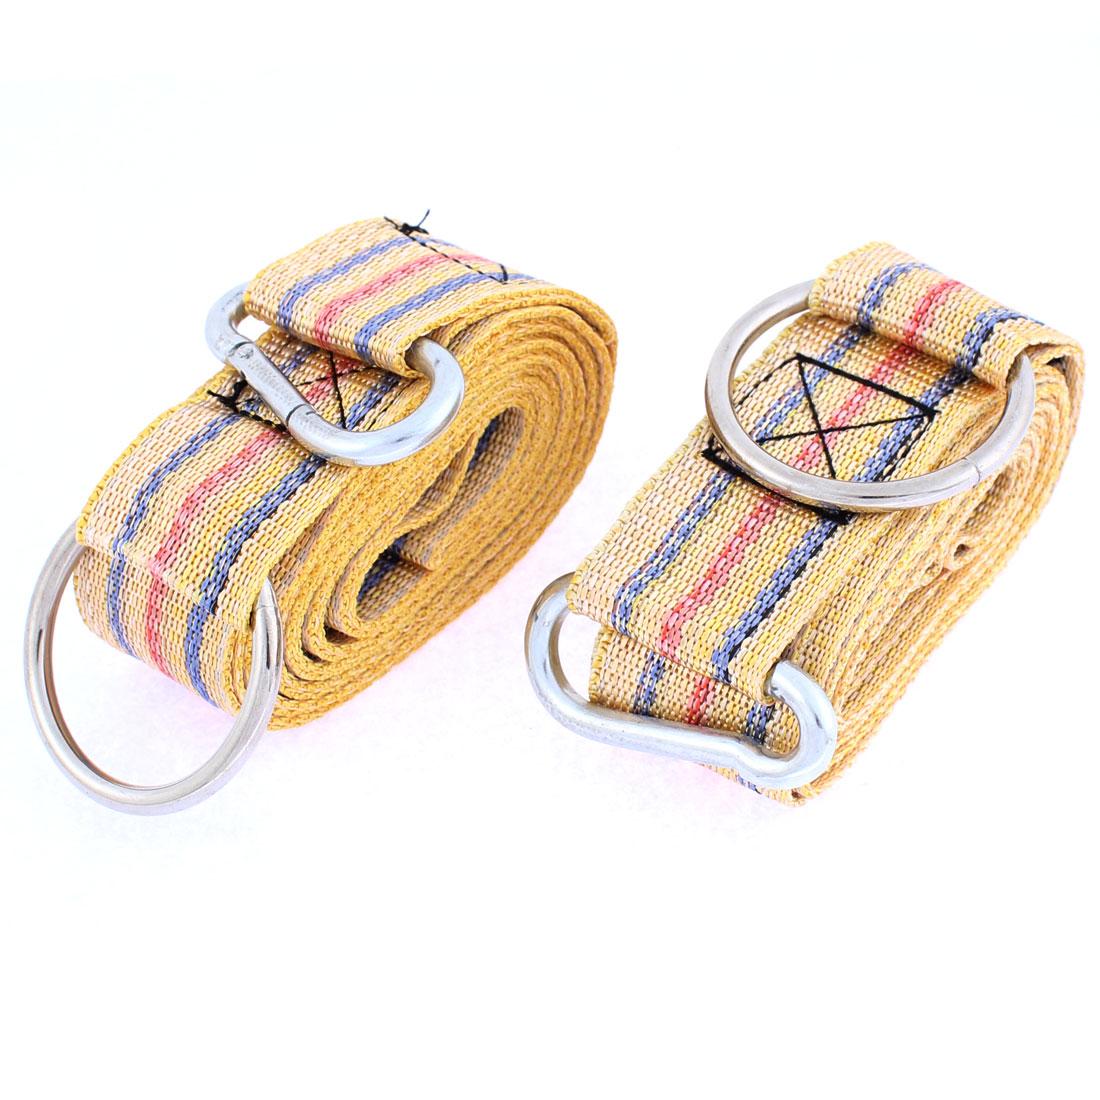 2Pcs 3.8cm Width 2.5M Long Stripe Print Yellow Nylon Hanging Hammock Strap Safety Belt Band w Hook